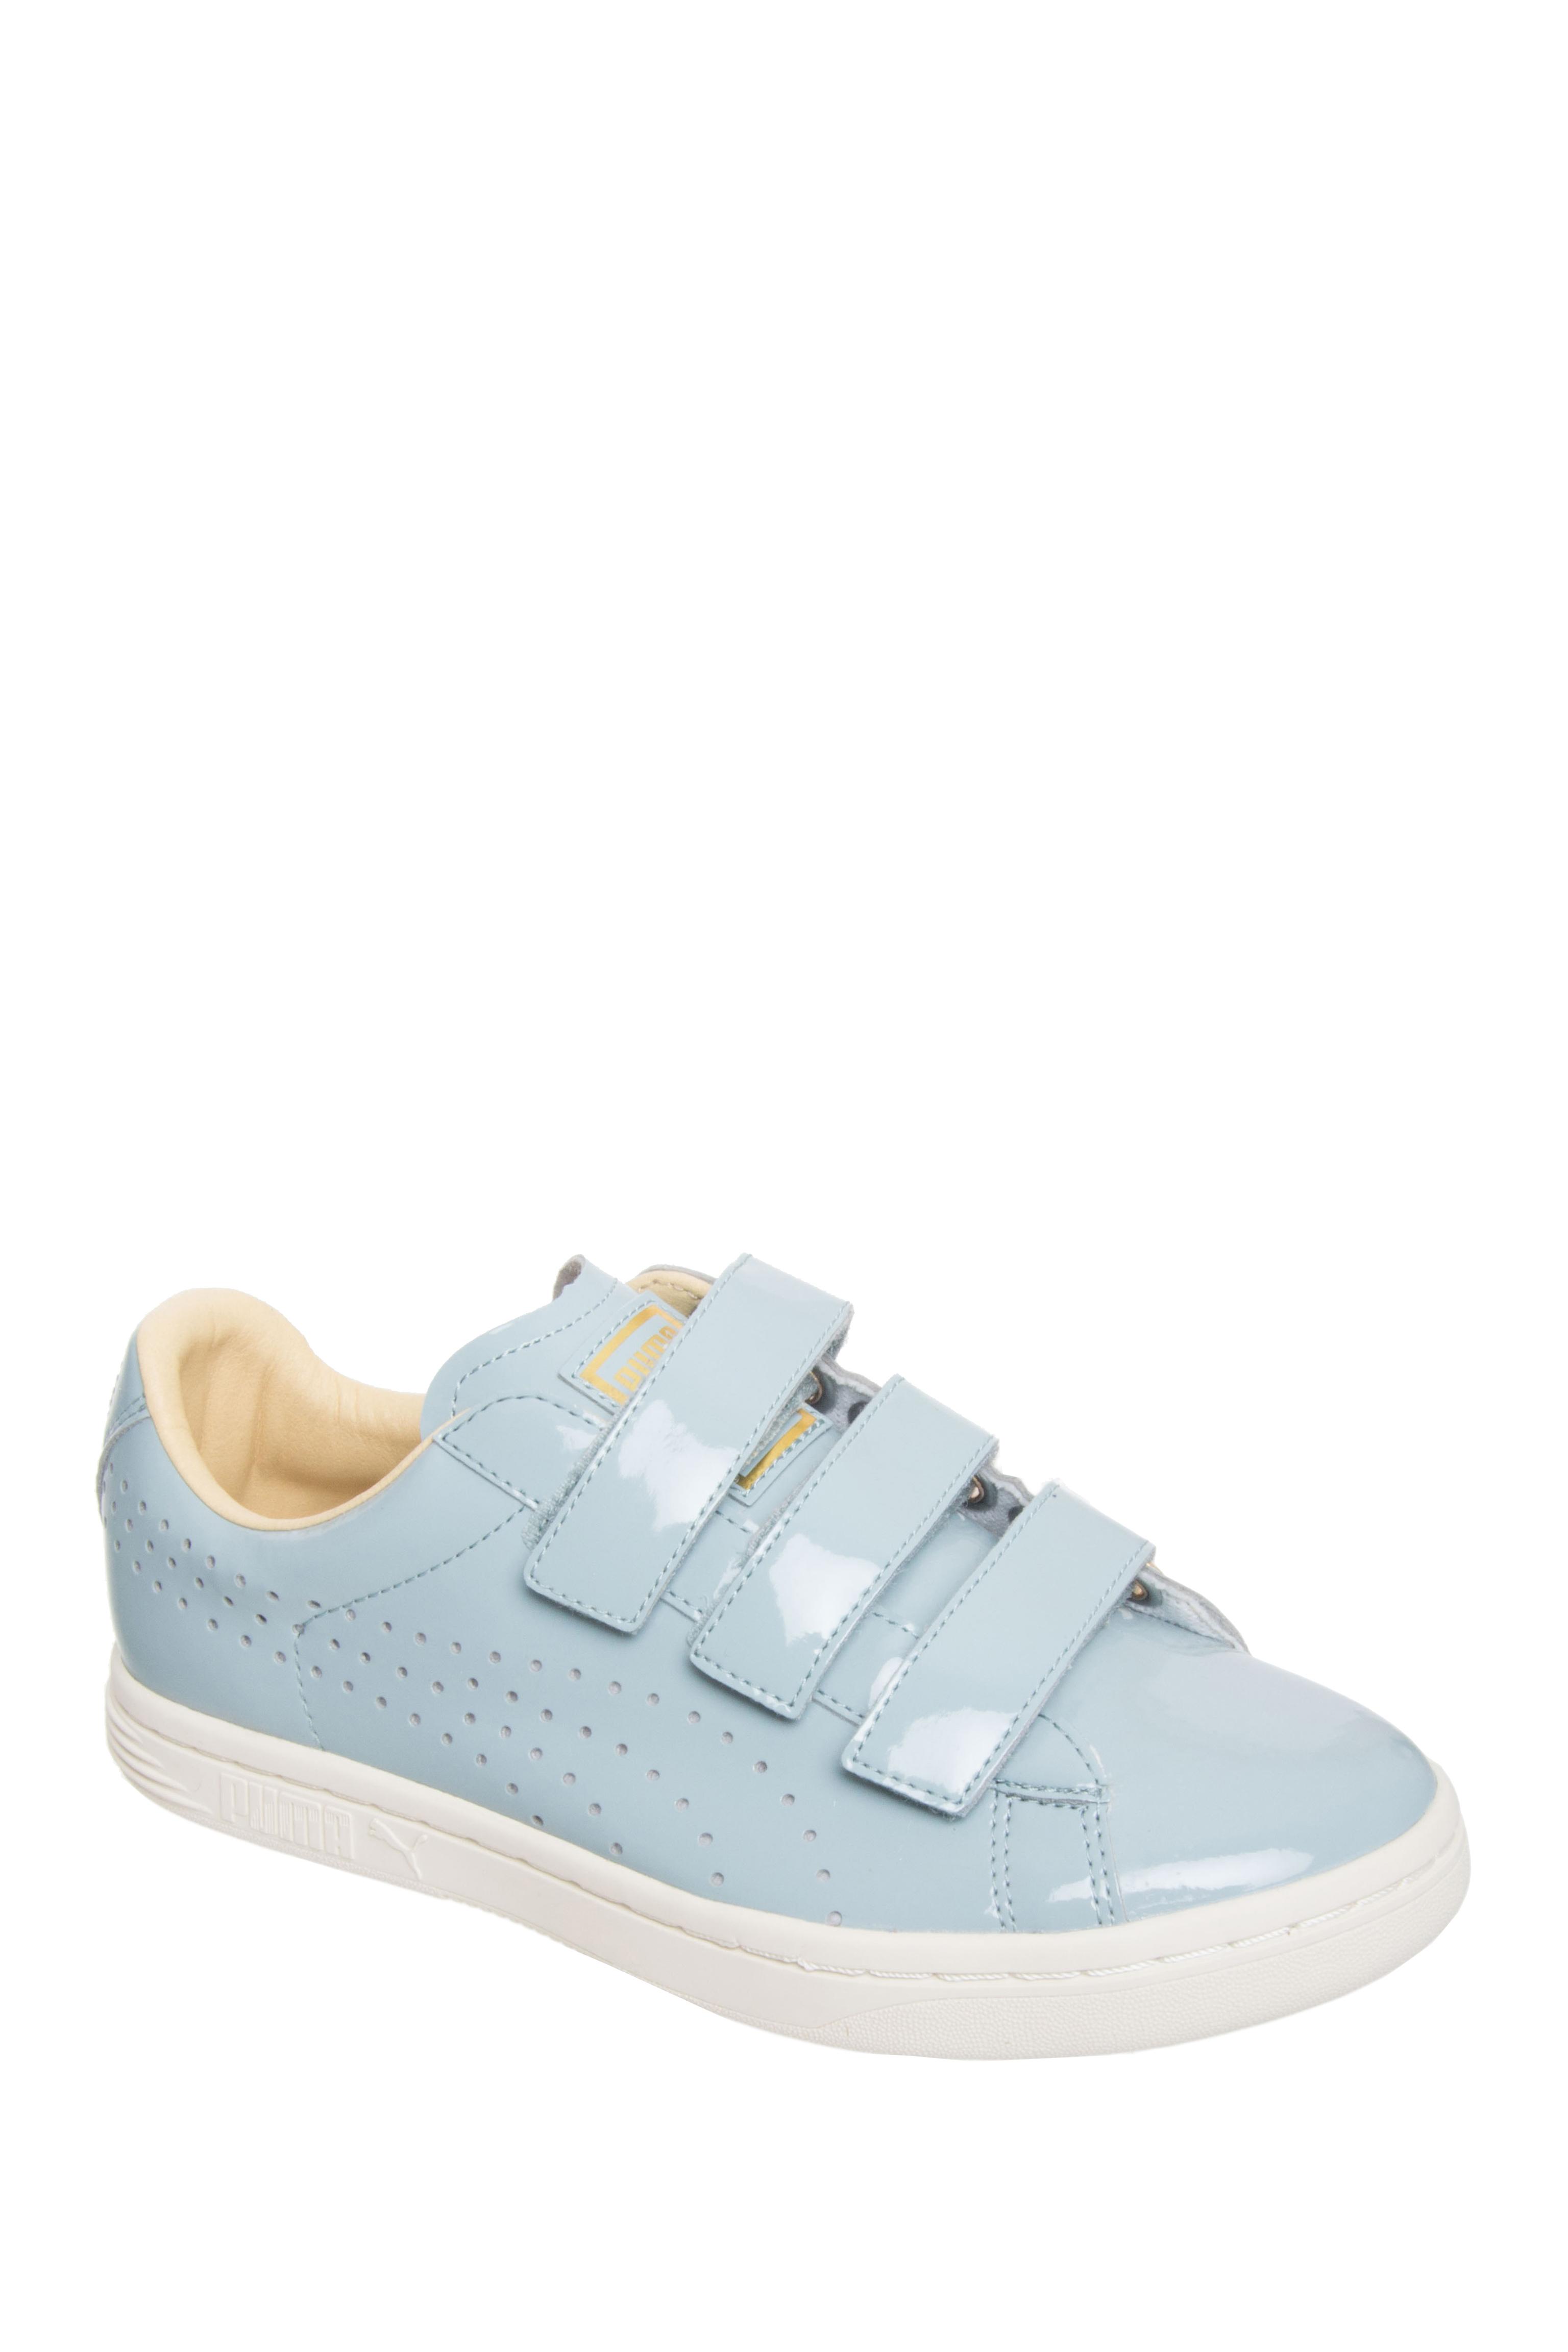 Puma Court Star Velcro Low Top Sneakers - Slate